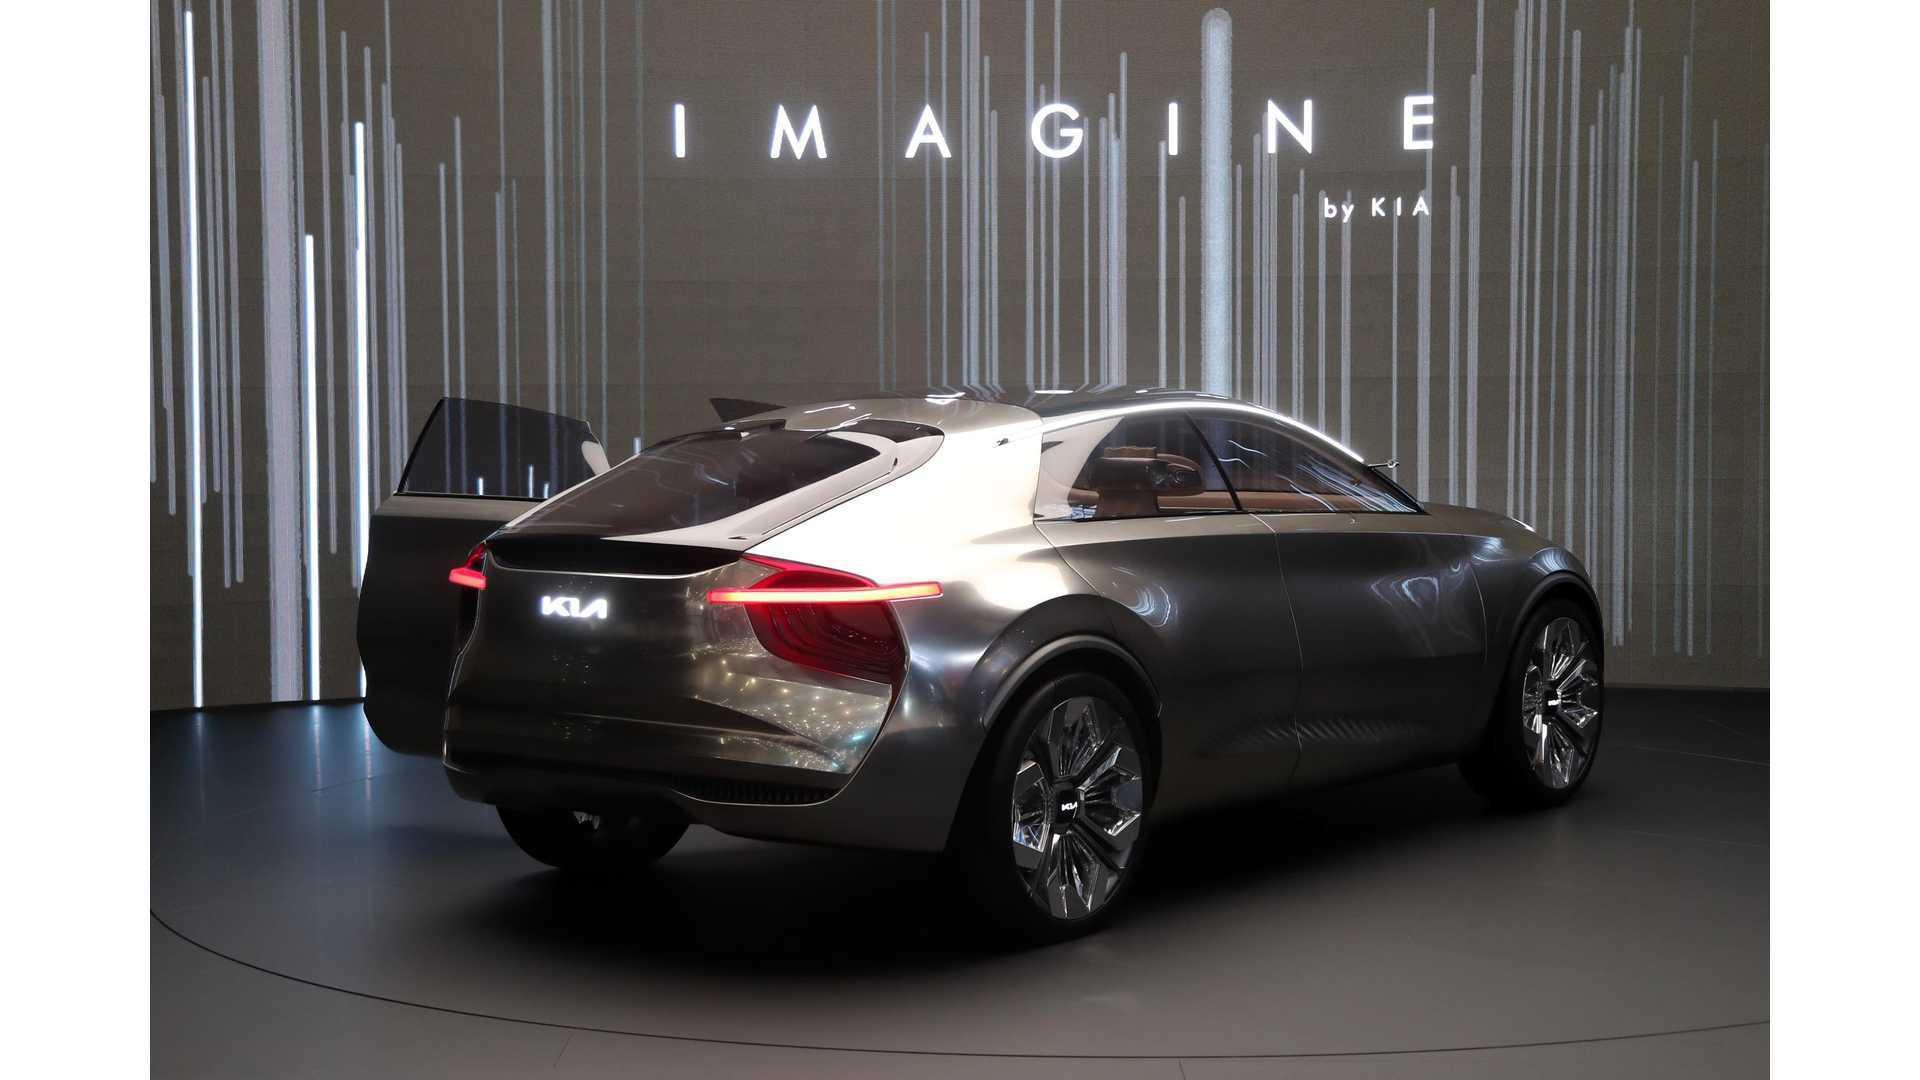 https://cdn.motor1.com/images/mgl/jJzNe/s6/kia-imagine-concept.jpg